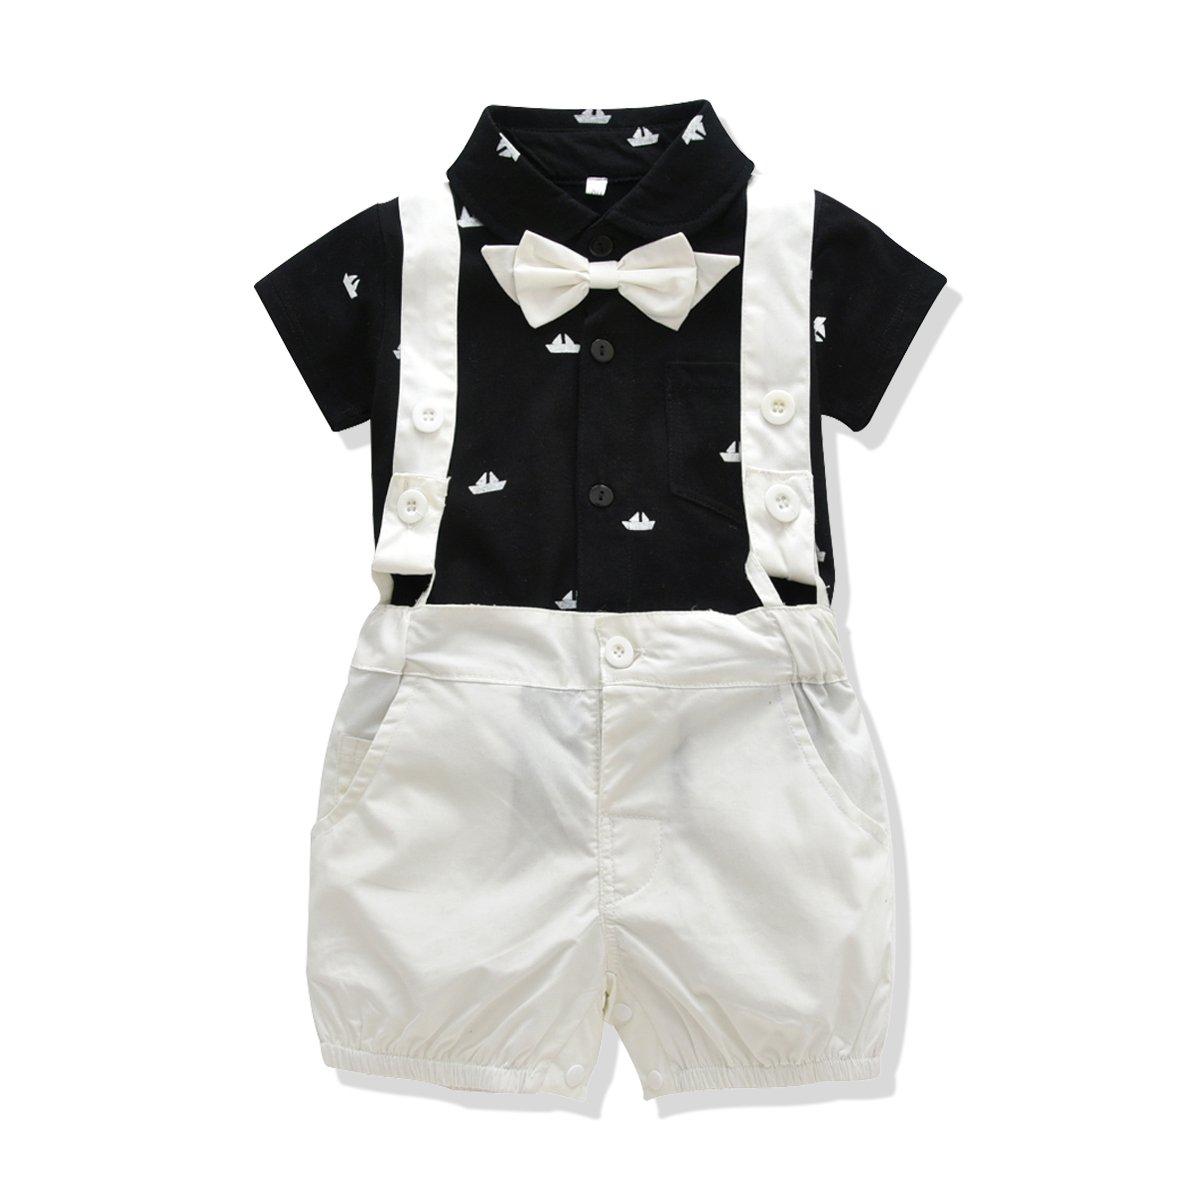 FERENYI US Baby Boys Bowtie Gentleman Romper Jumpsuit Overalls Rompers (0-6 Months, Black 3)